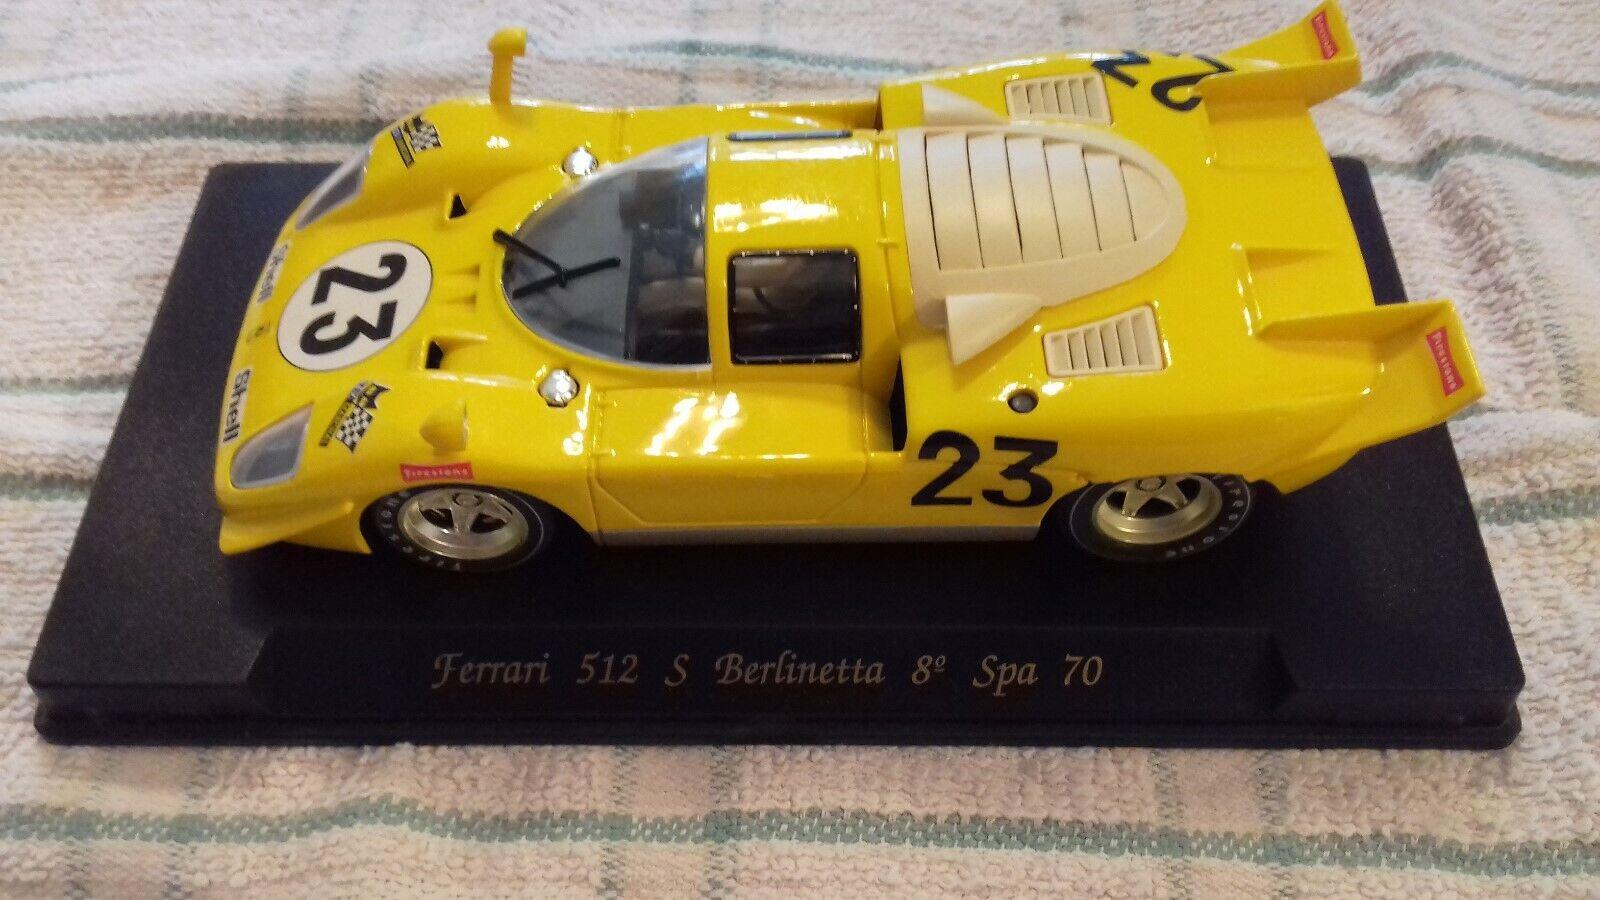 FLY C22 Ferrari 512 S Berlinetta 8th Spa 1970